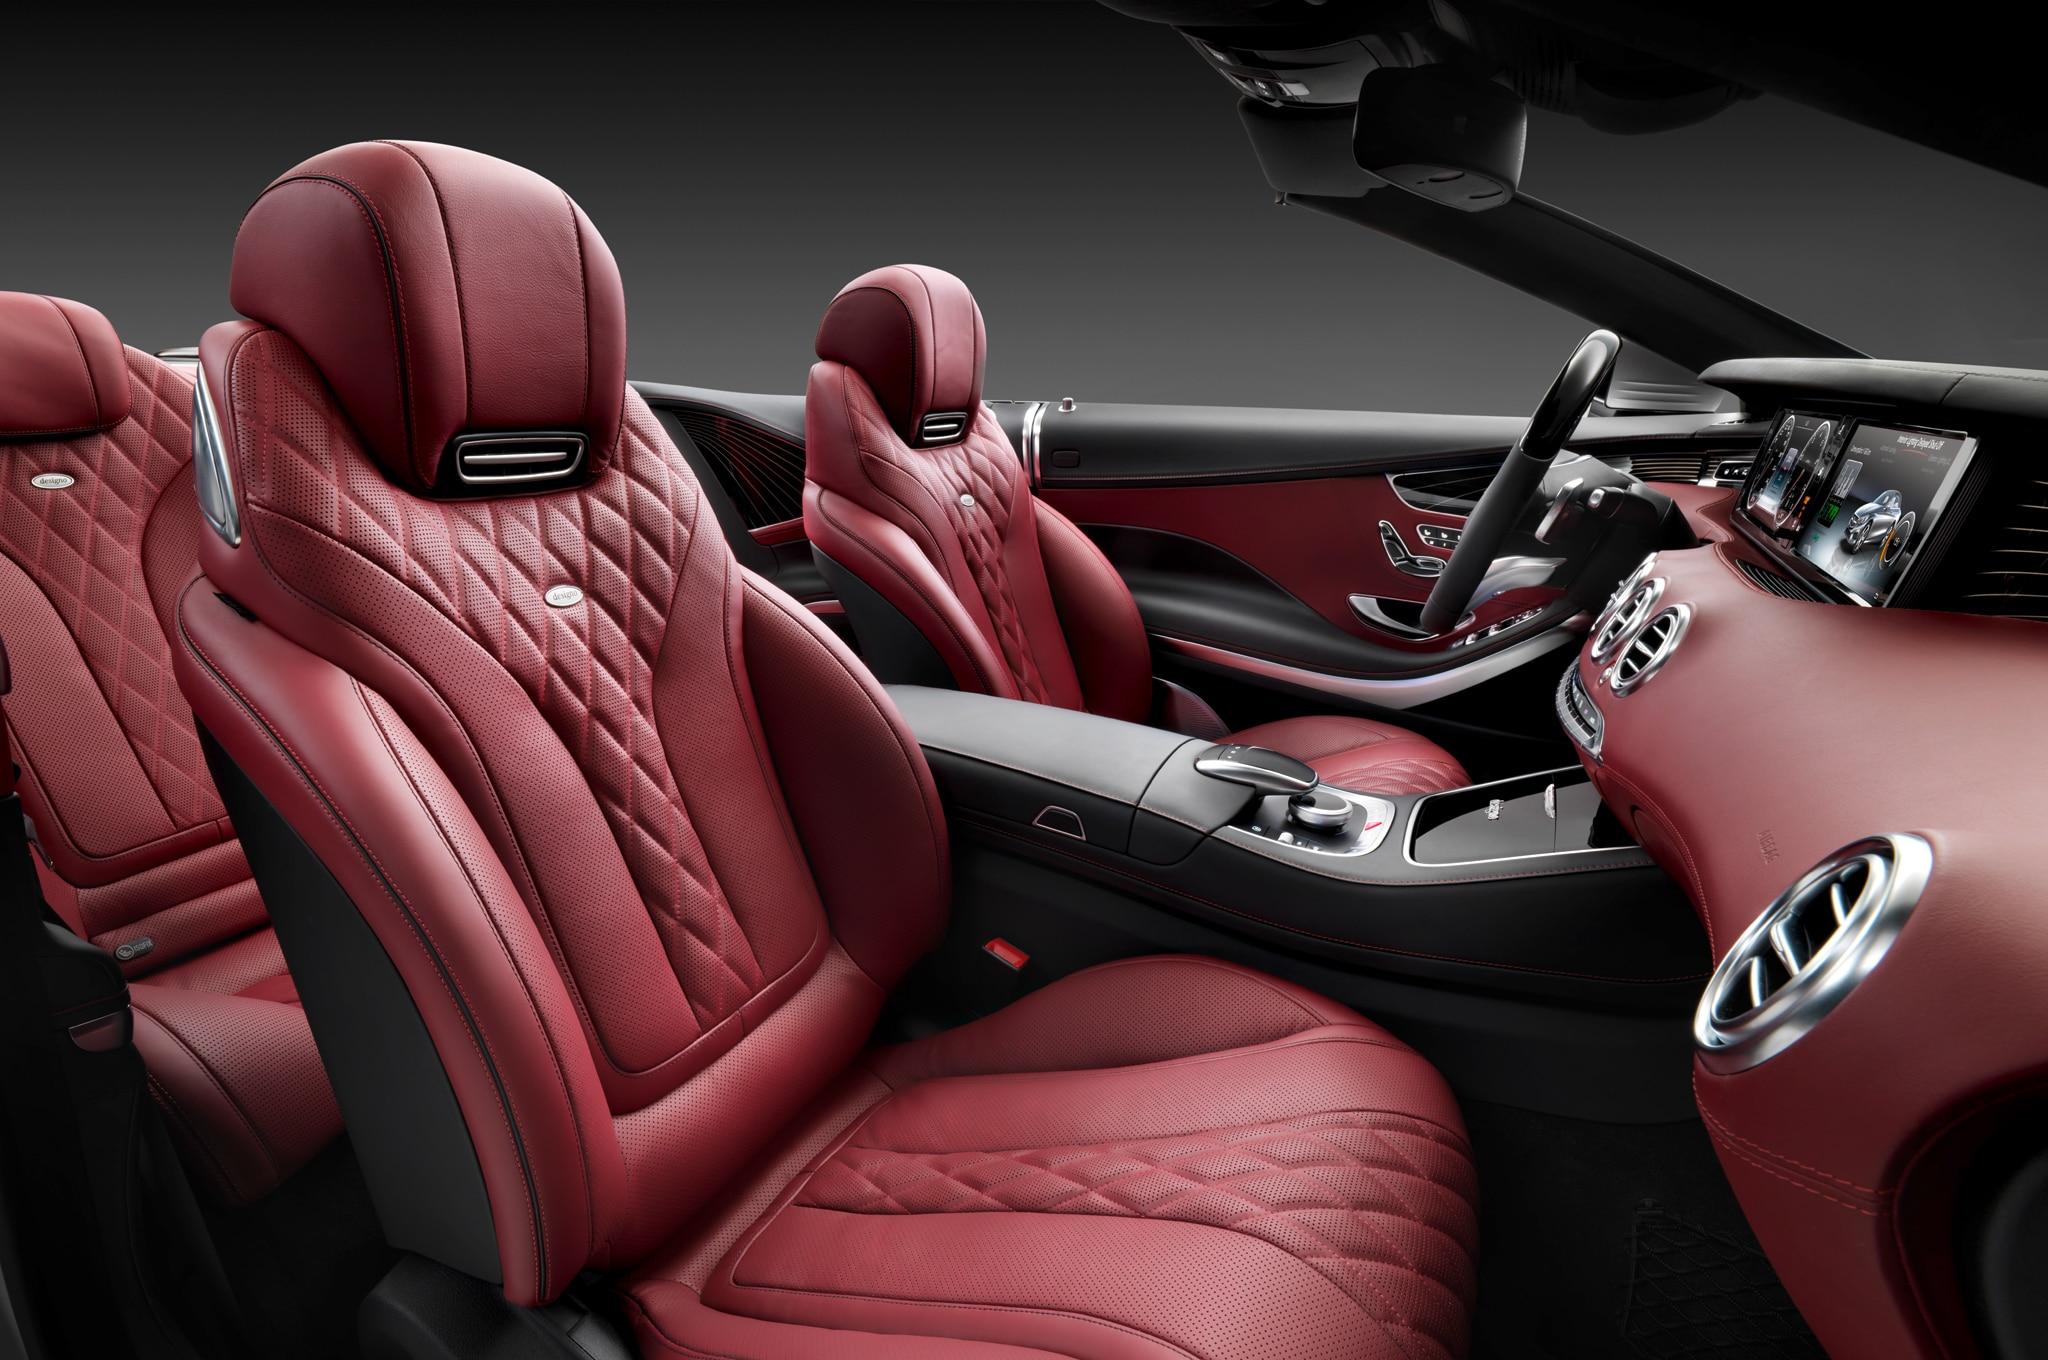 Benz cla class cla 250 edition 1 interior 1920x1080 59 of 183 - Show More